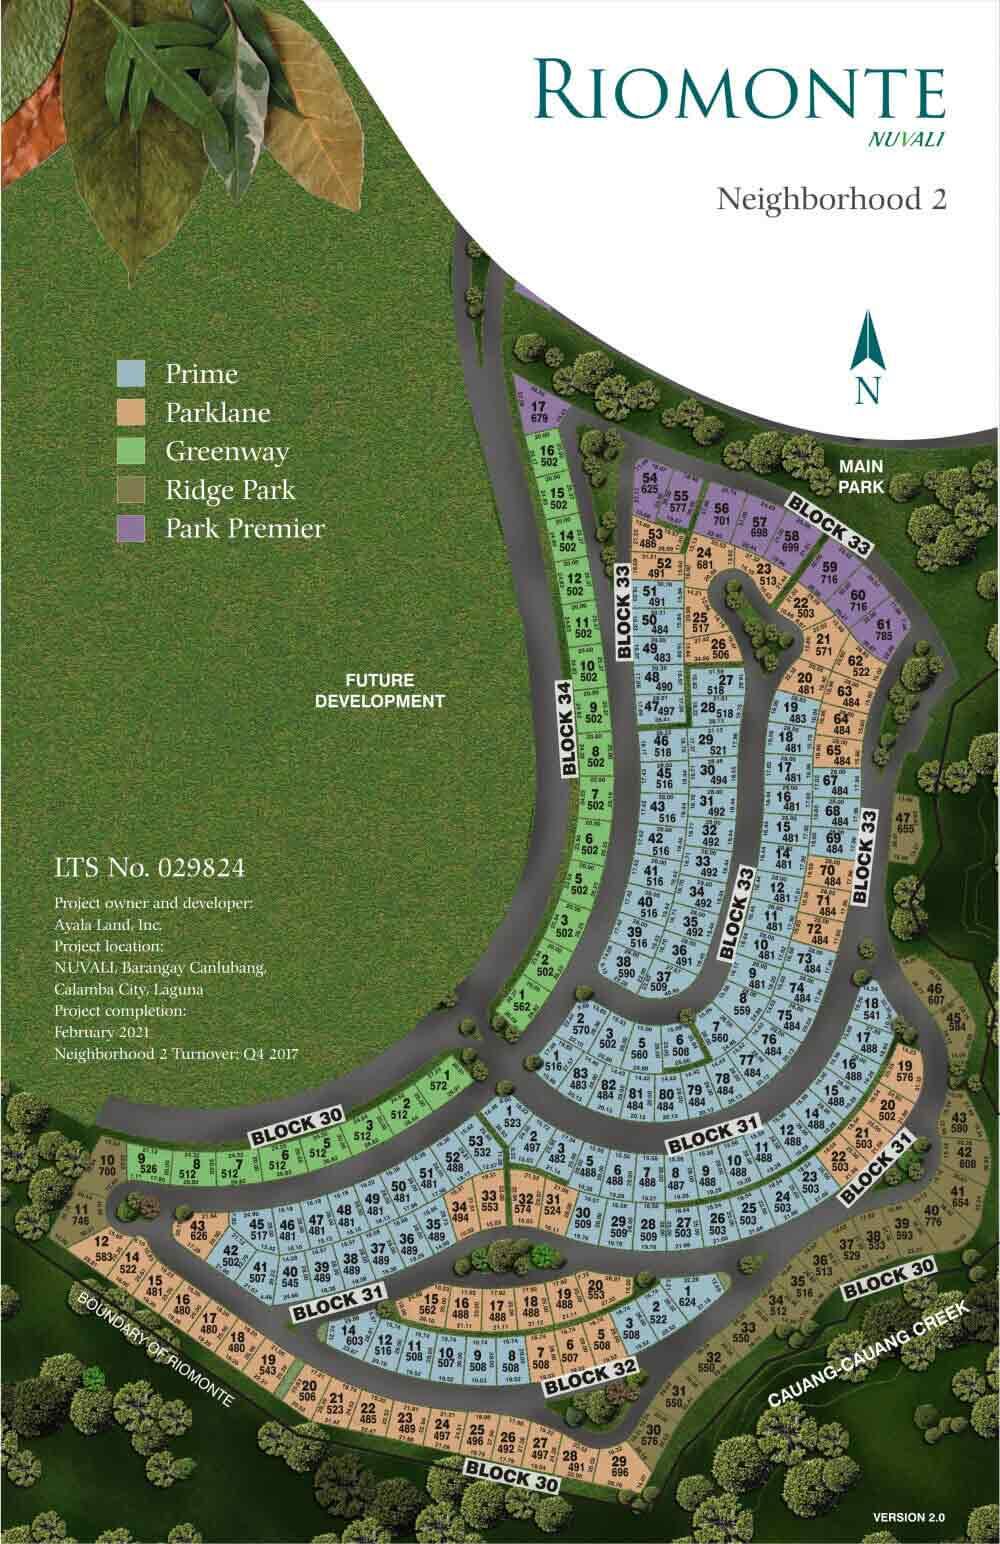 Riomonte - Site Development Plan - Phase 2